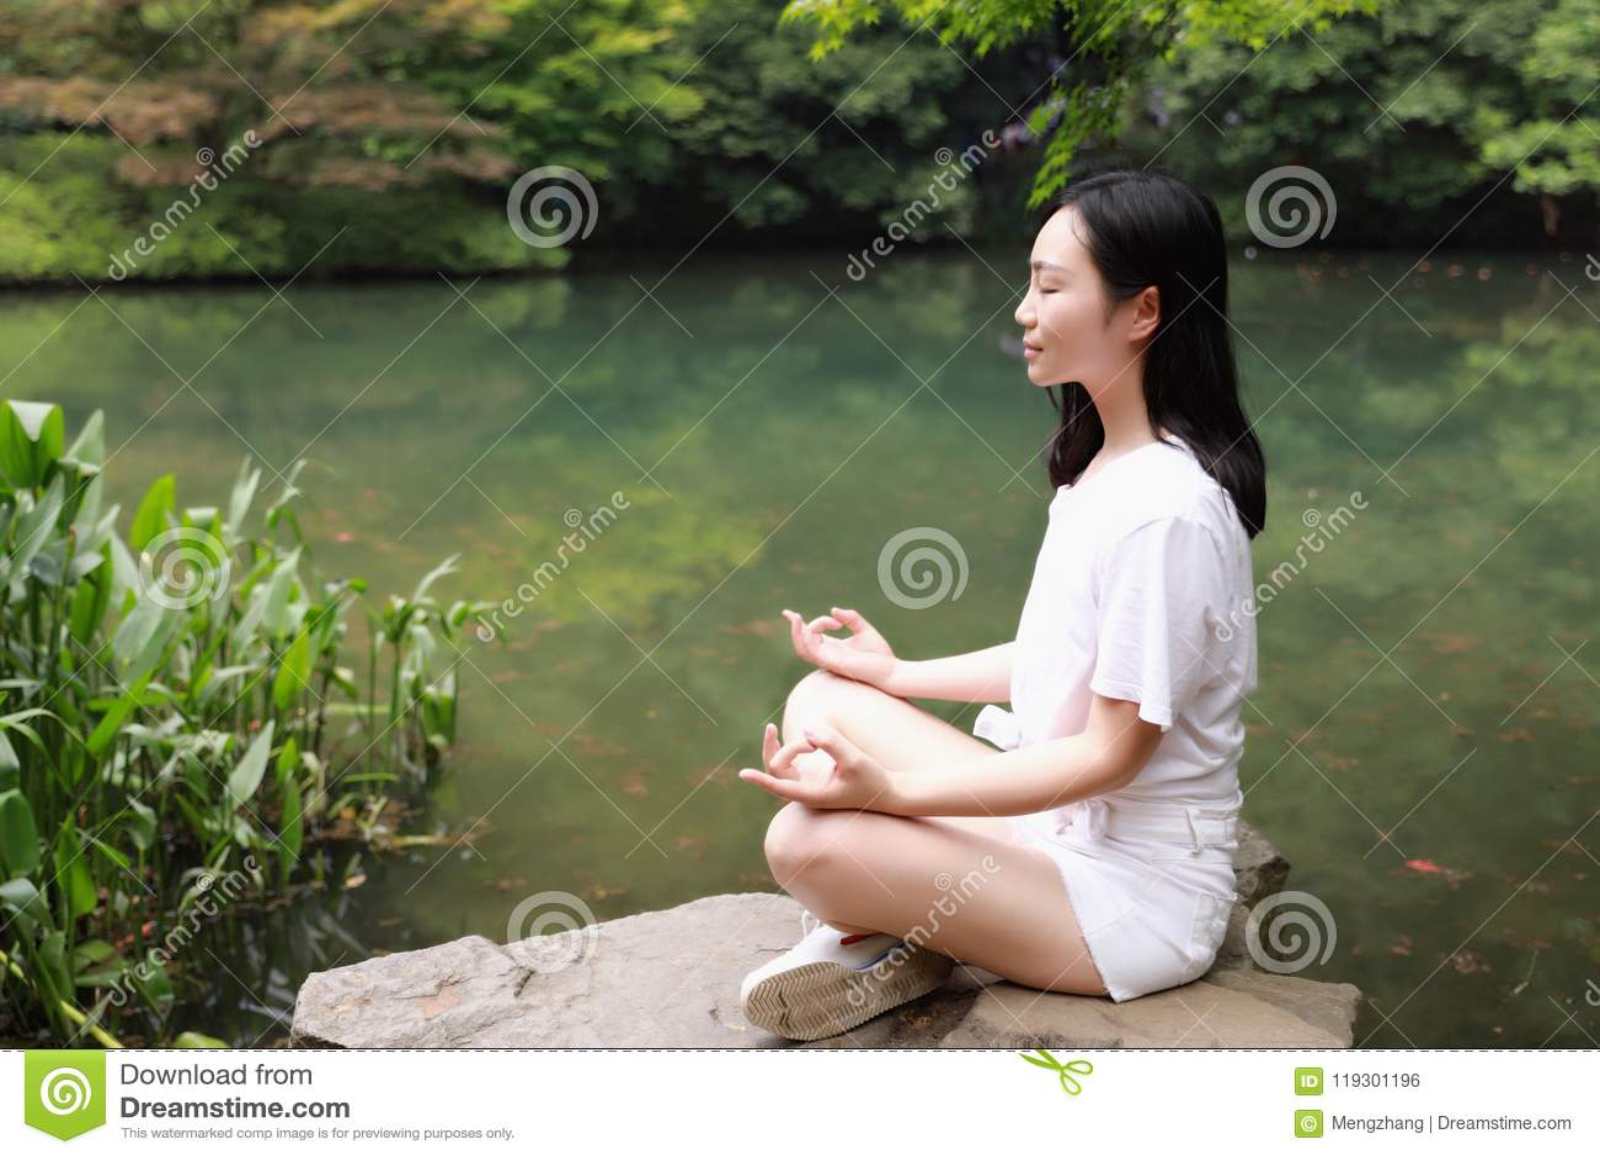 A Happy Free Smile Peace Balance Meditation Beauty Girl Asian